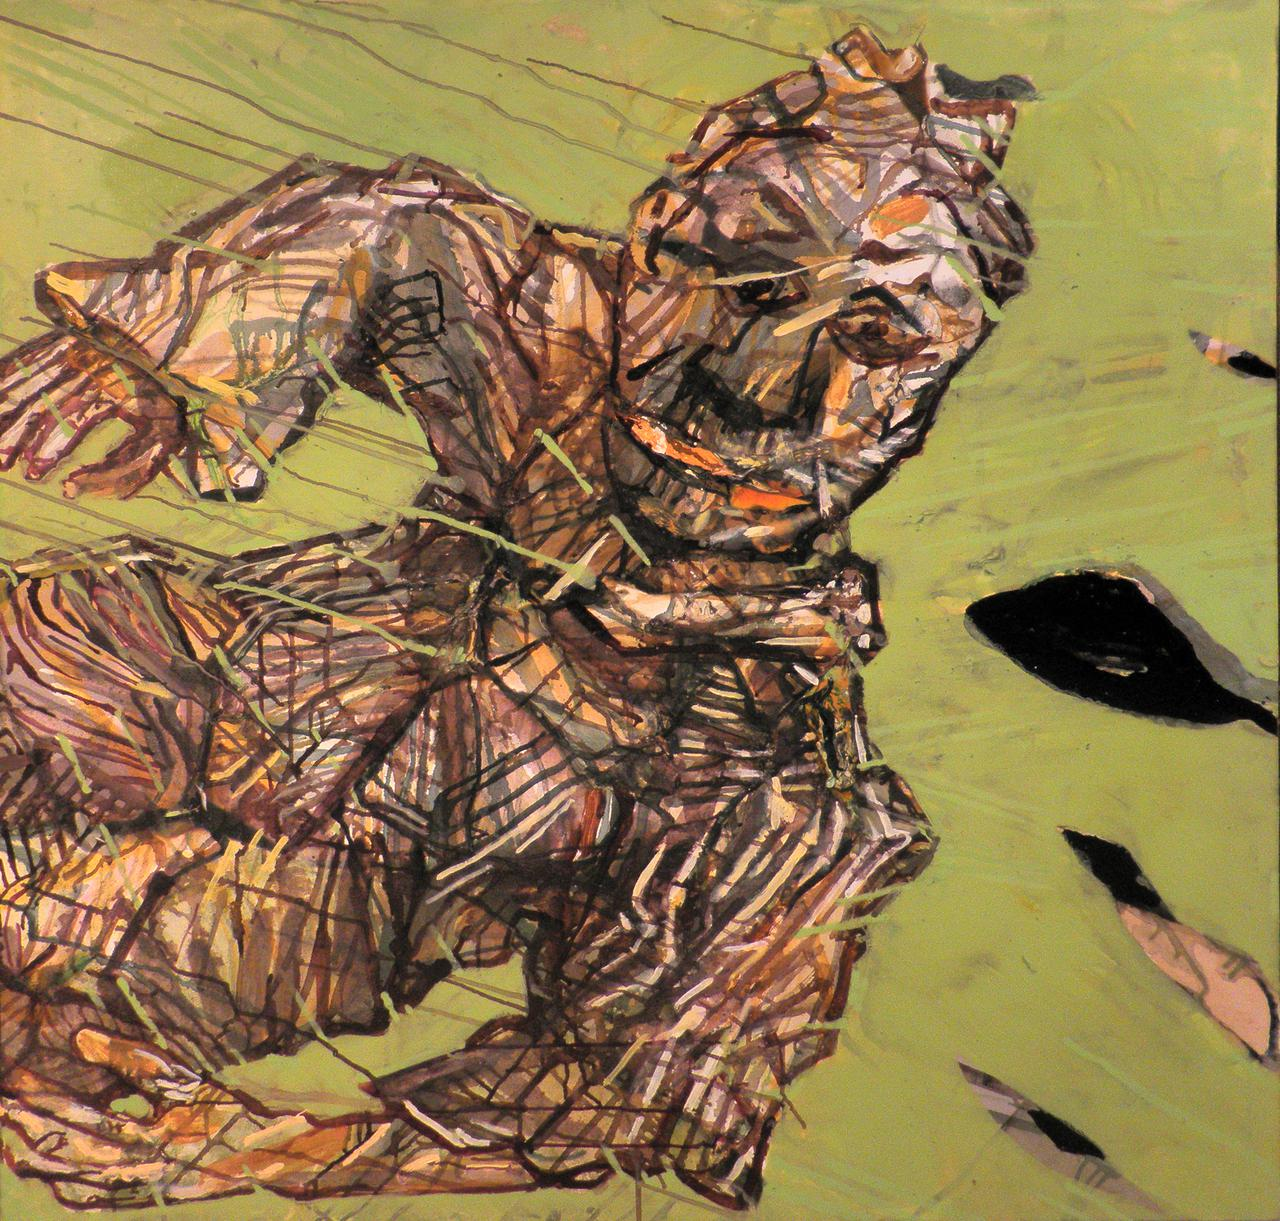 Haralabos Katsatsidis, Falling man, 1 m x 1 m, oil on canvas, 2018